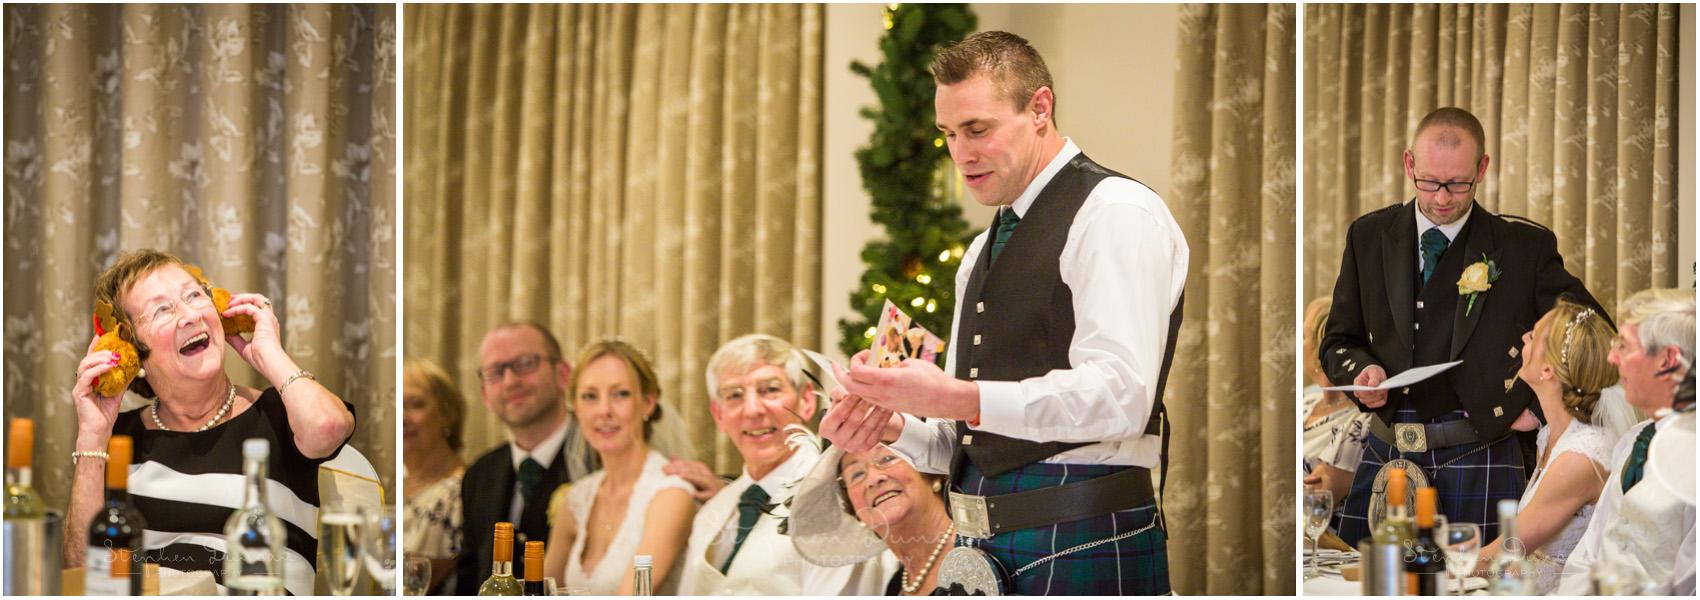 Romsey Abbey wedding photographer best man's speech